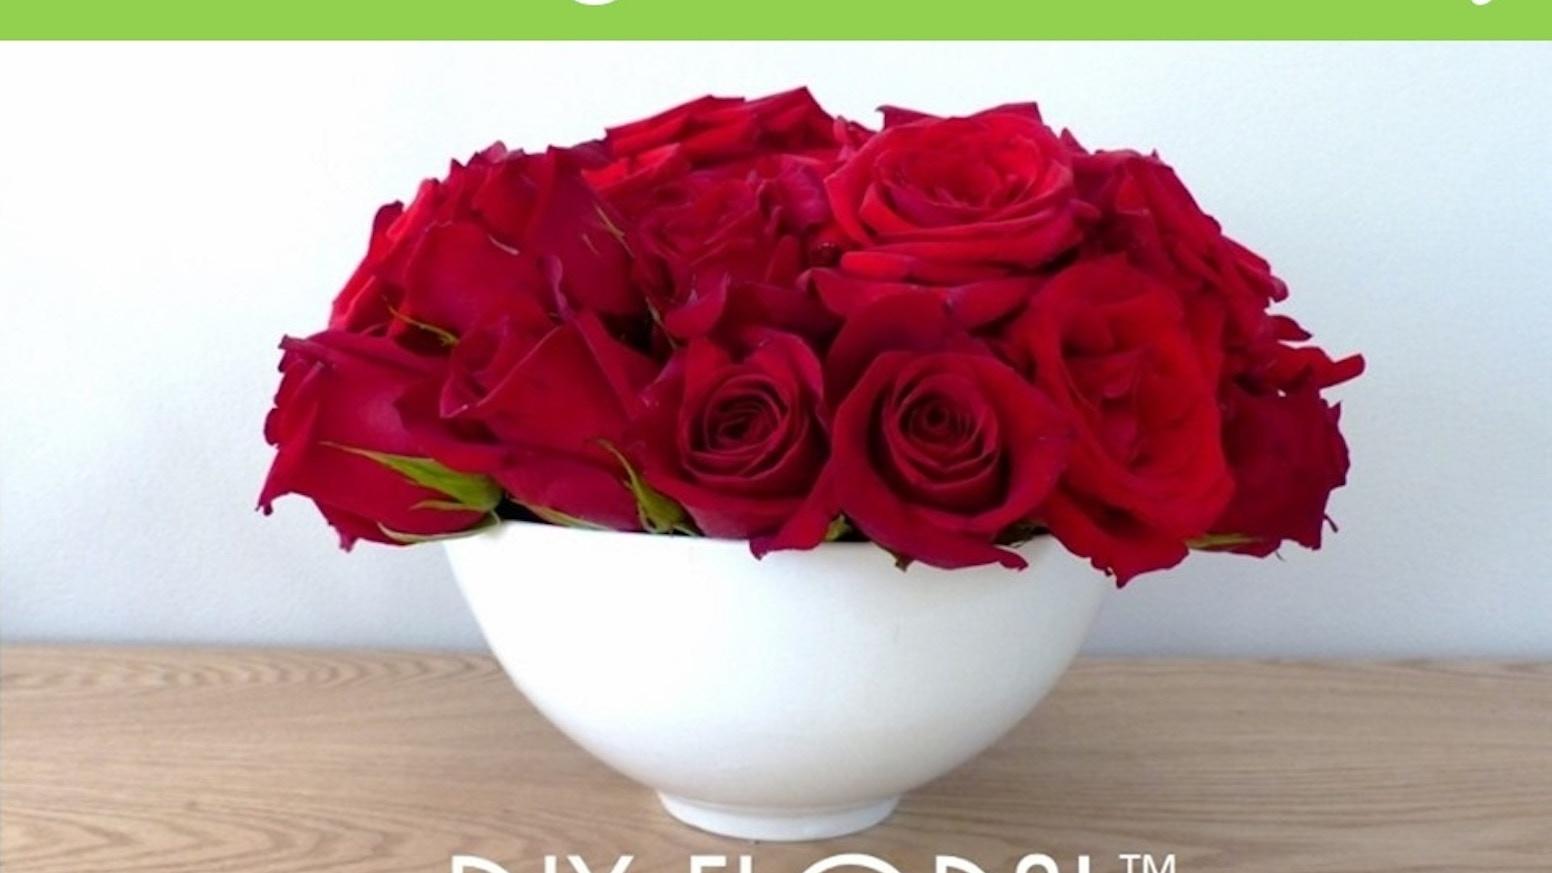 Diy Floral Anyone Can Create Amazing Flower Arrangements By Adam